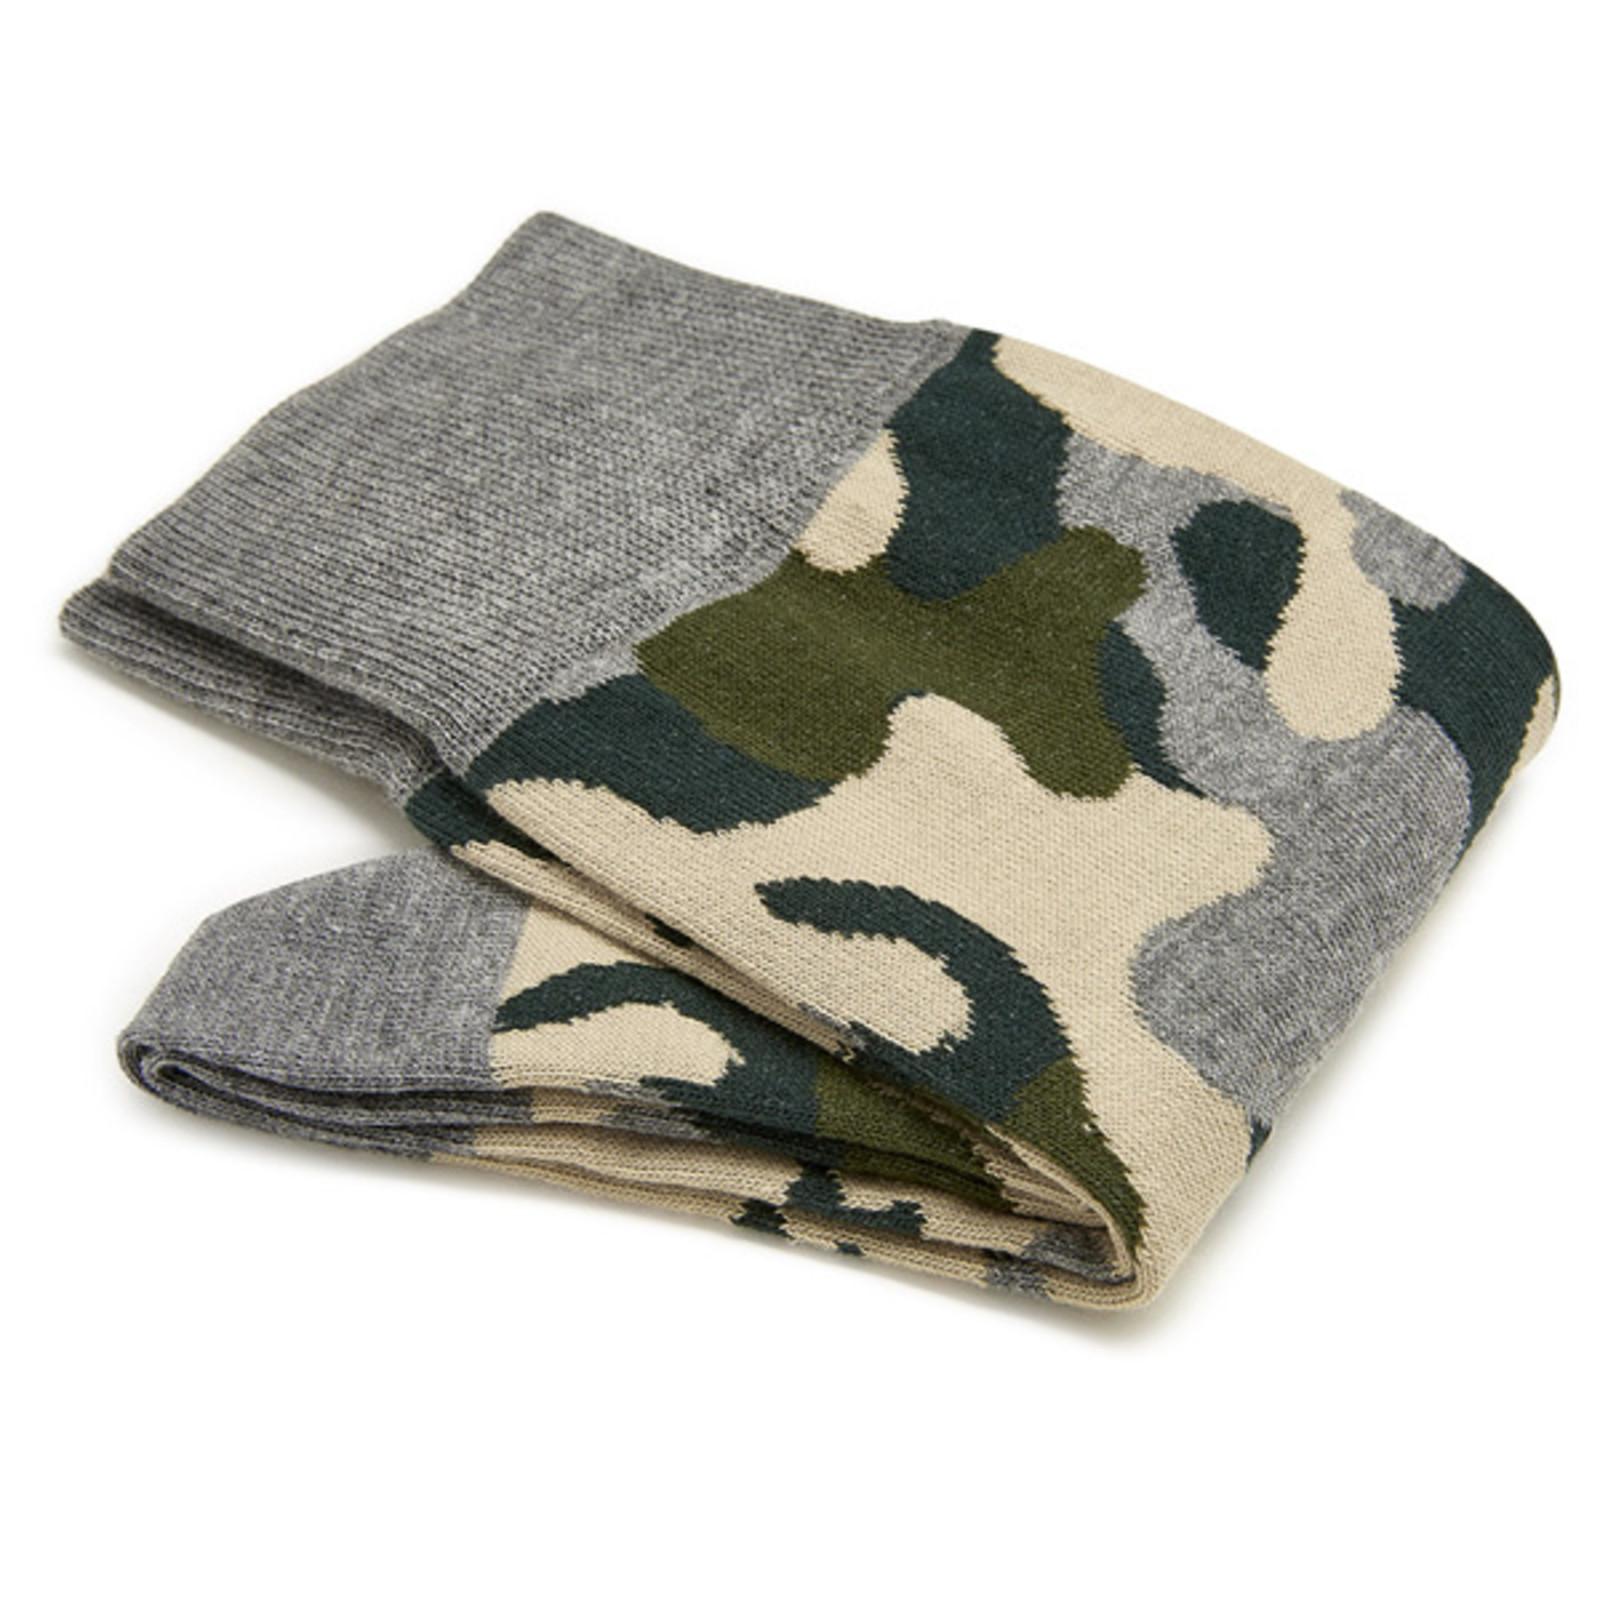 Carlo Lanza Green camouflage socks